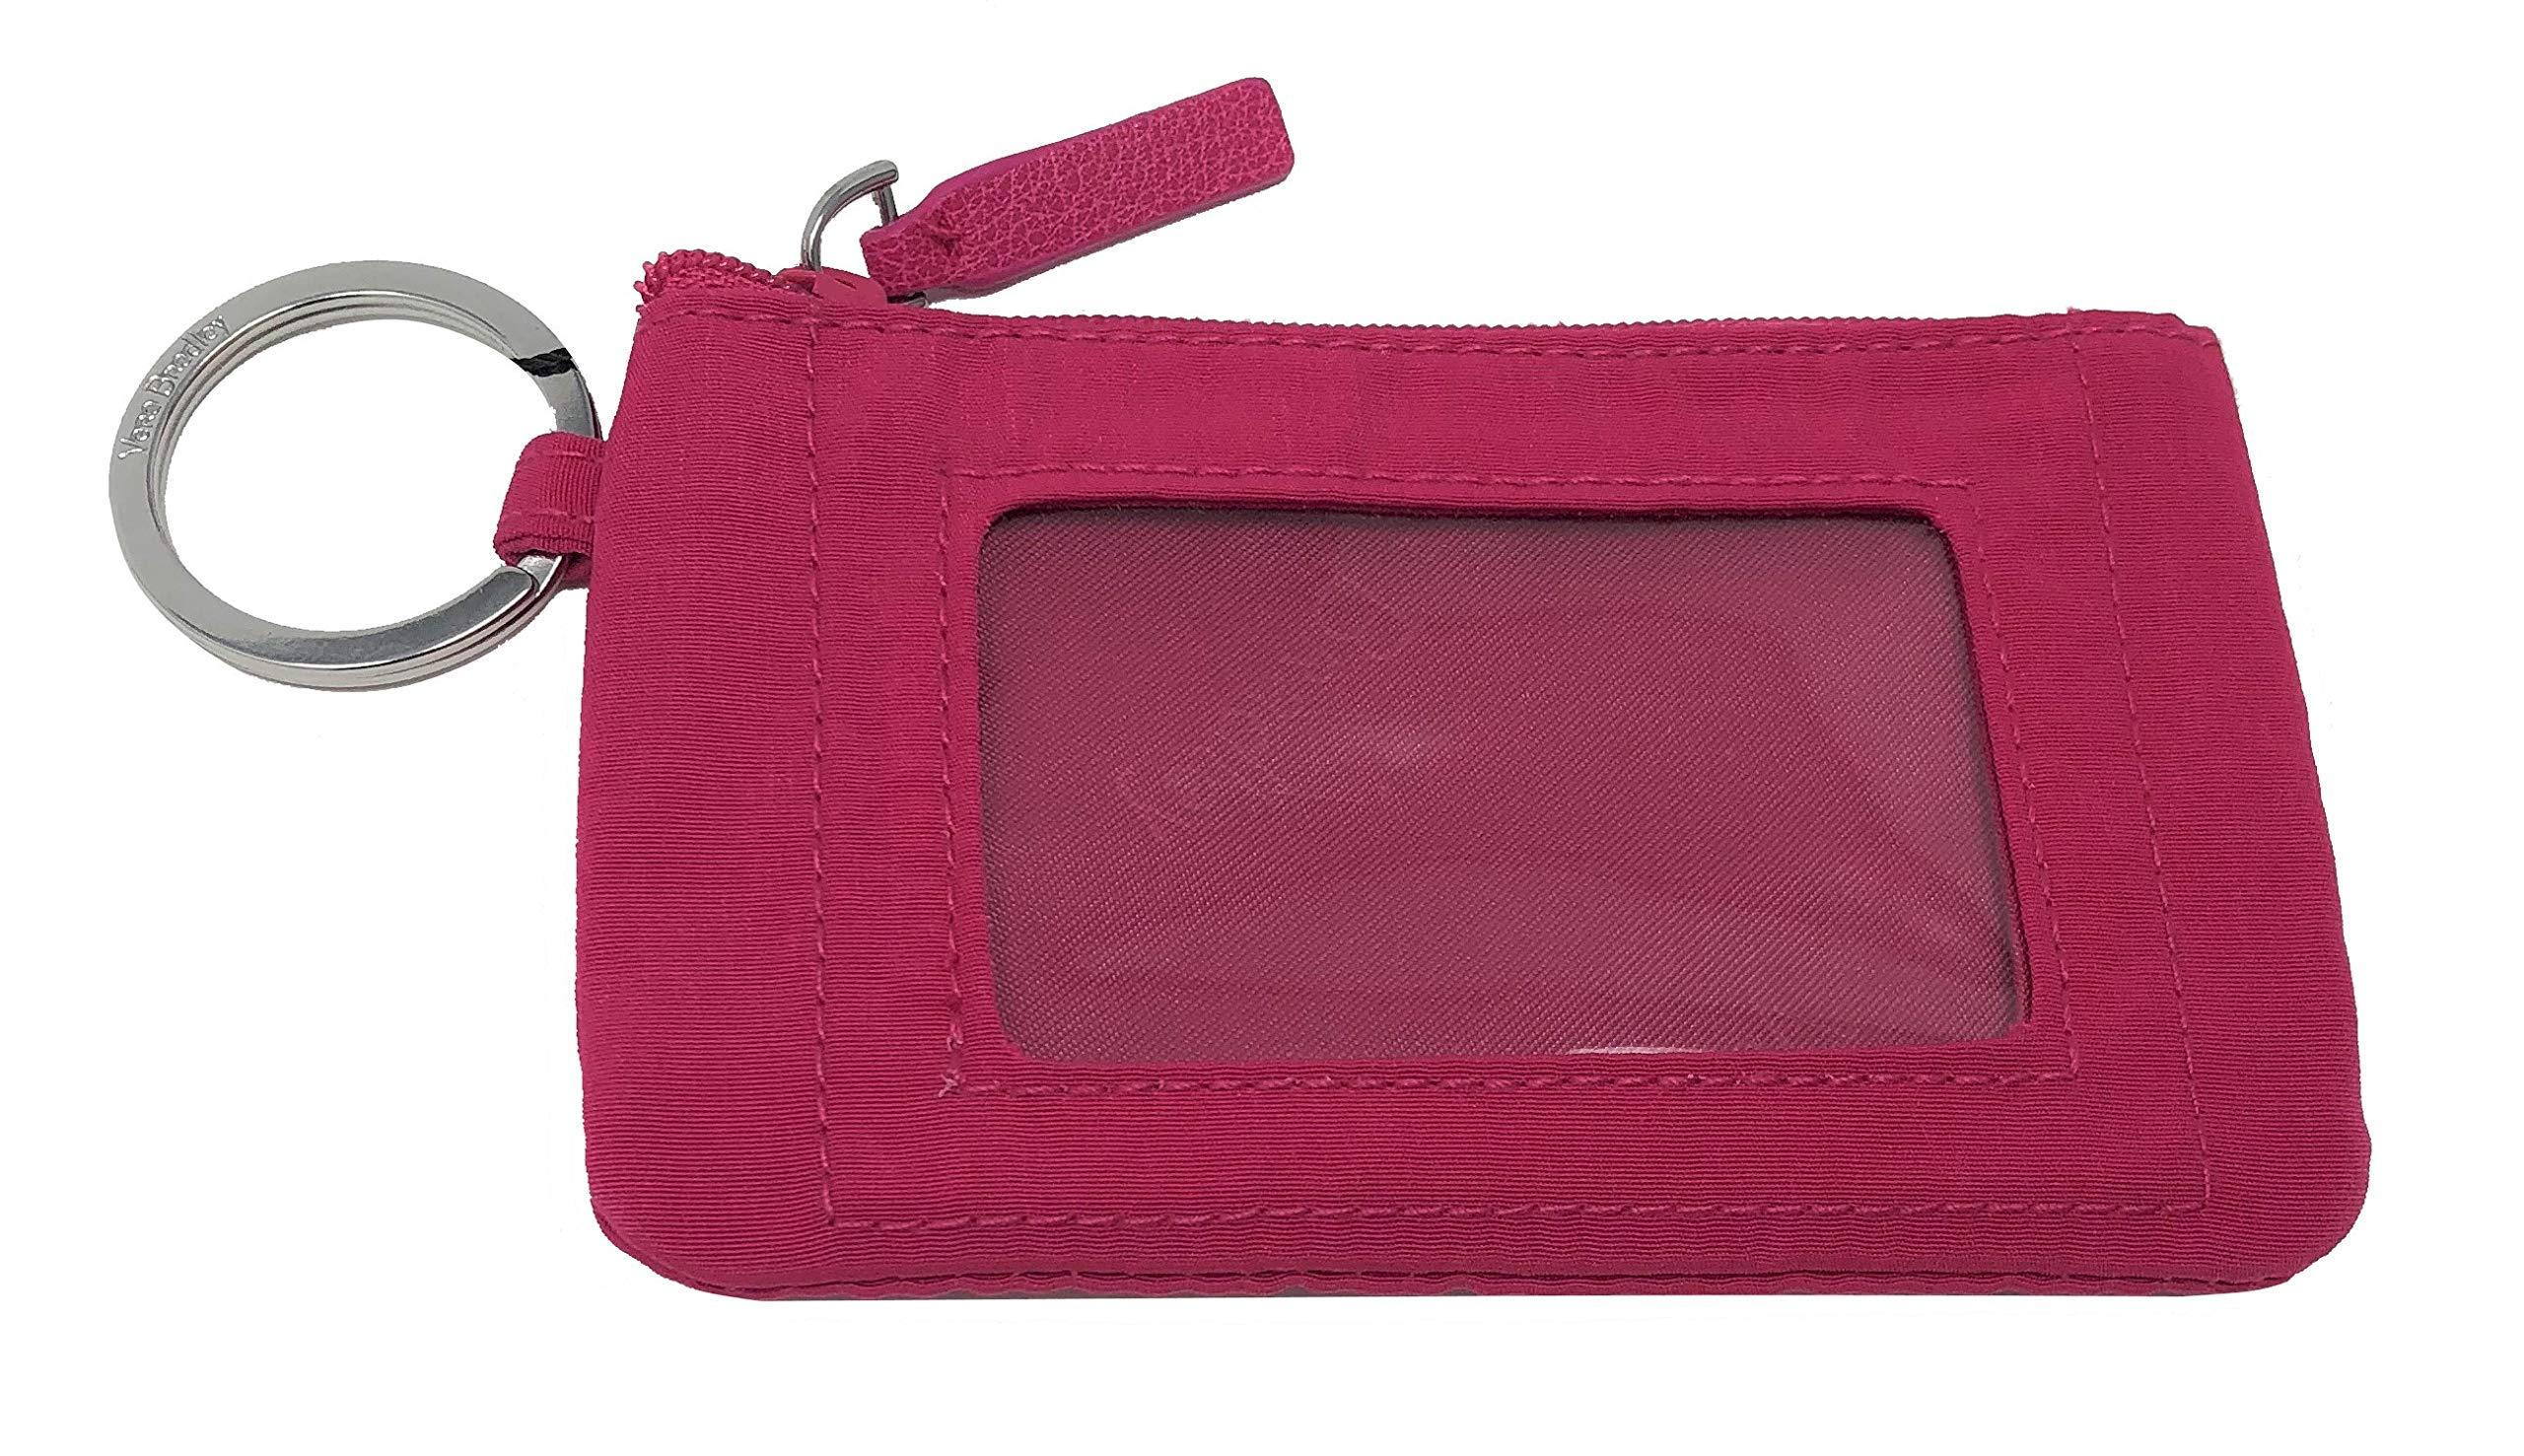 Vera Bradley Women's Zip ID Case in Fuchsia